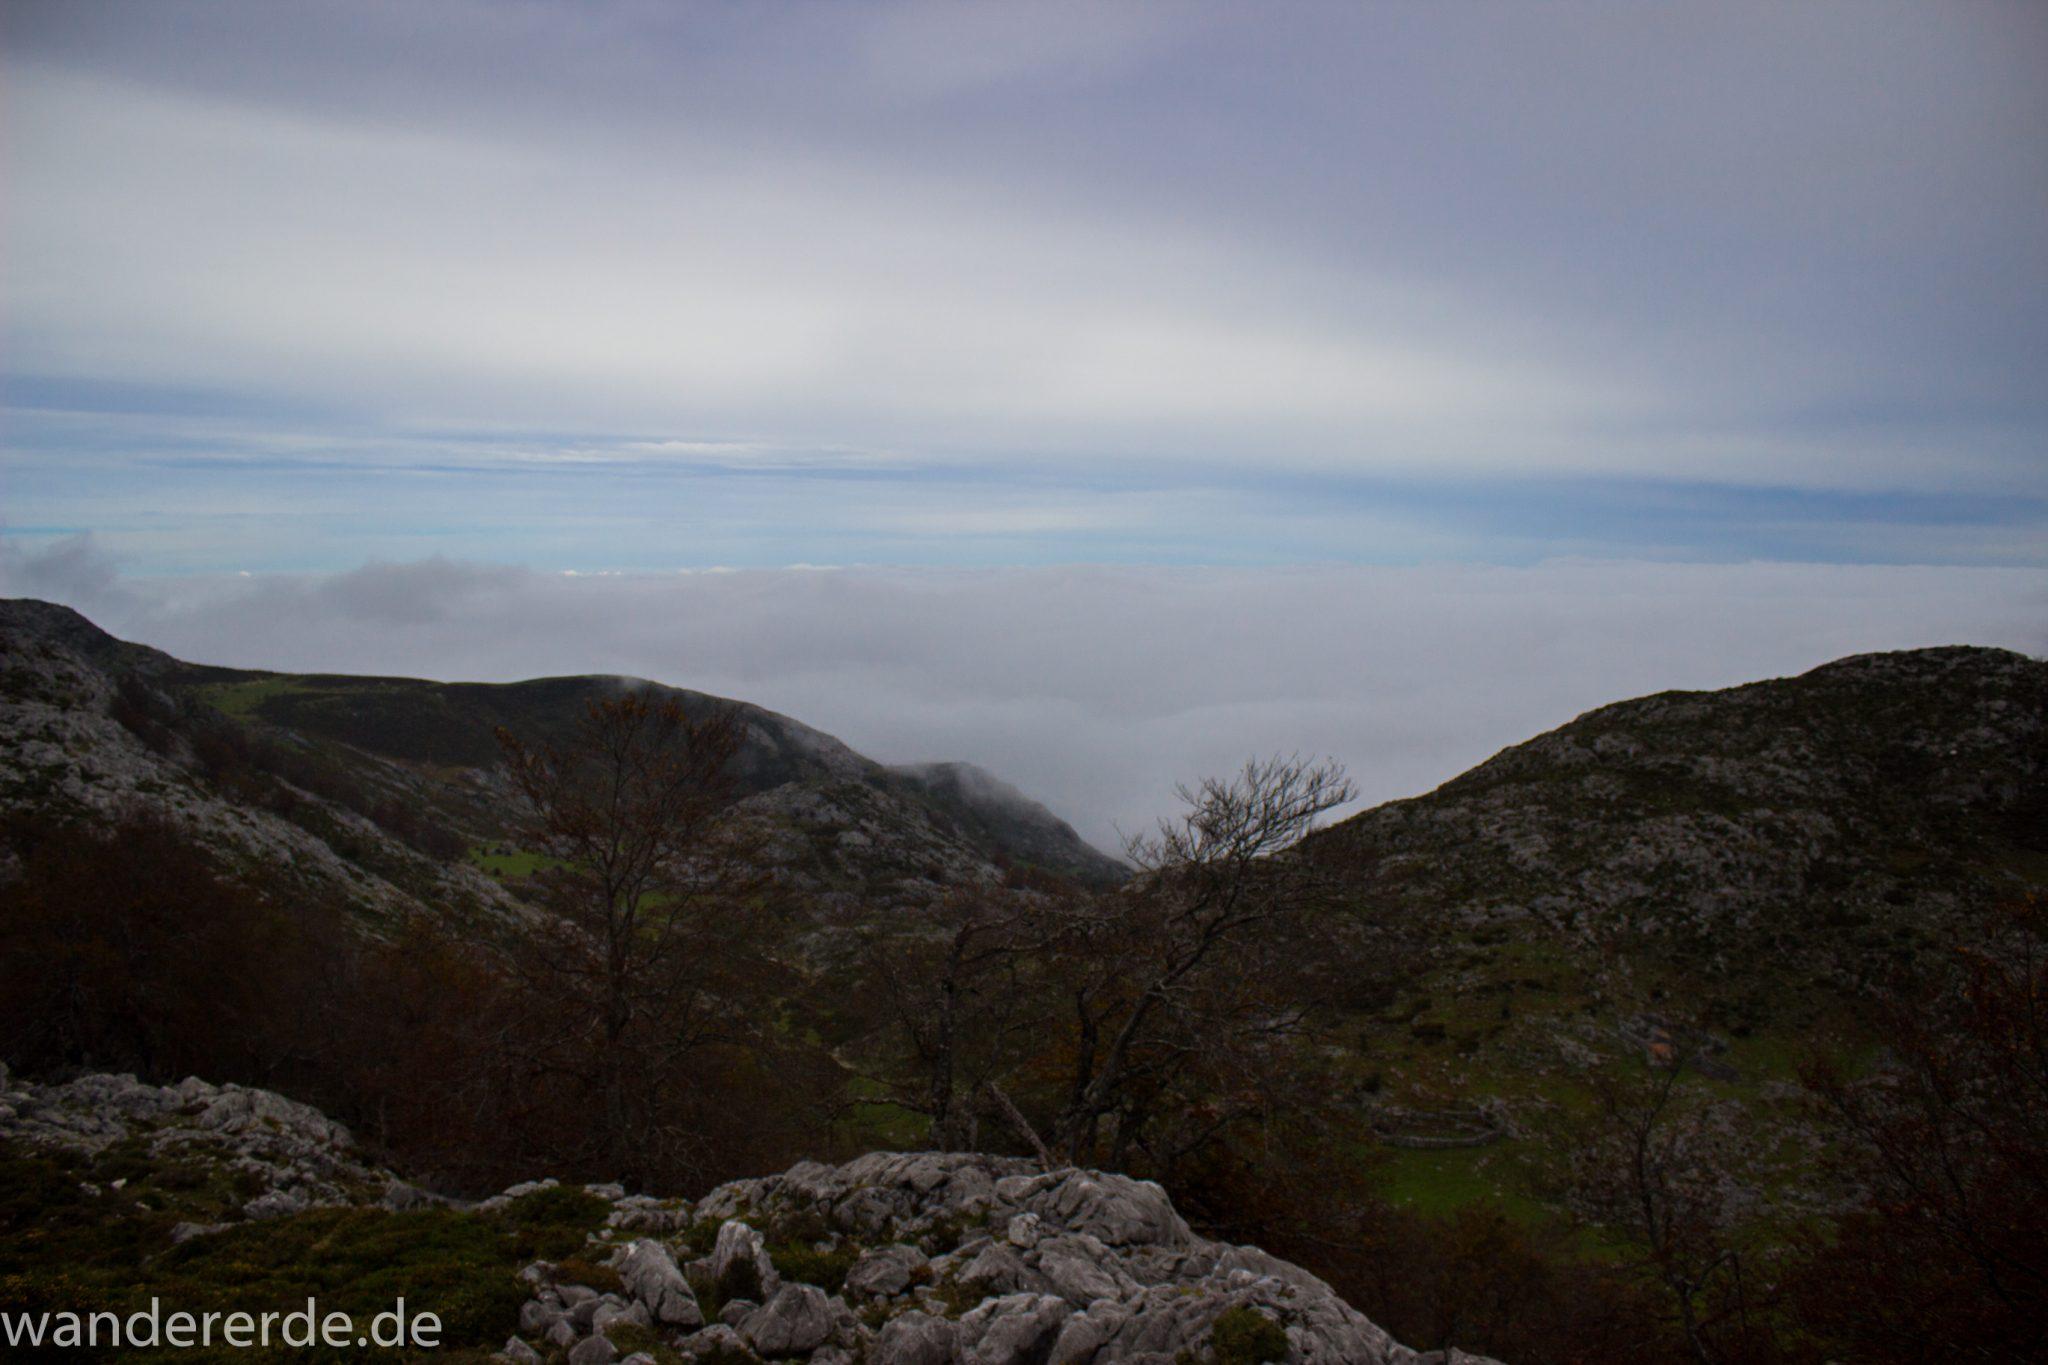 Wanderung Vega de Ario Picos de Europa Spanien, dichtes Wolkenband, Berge und Bäume, Nordspanien, Wandern